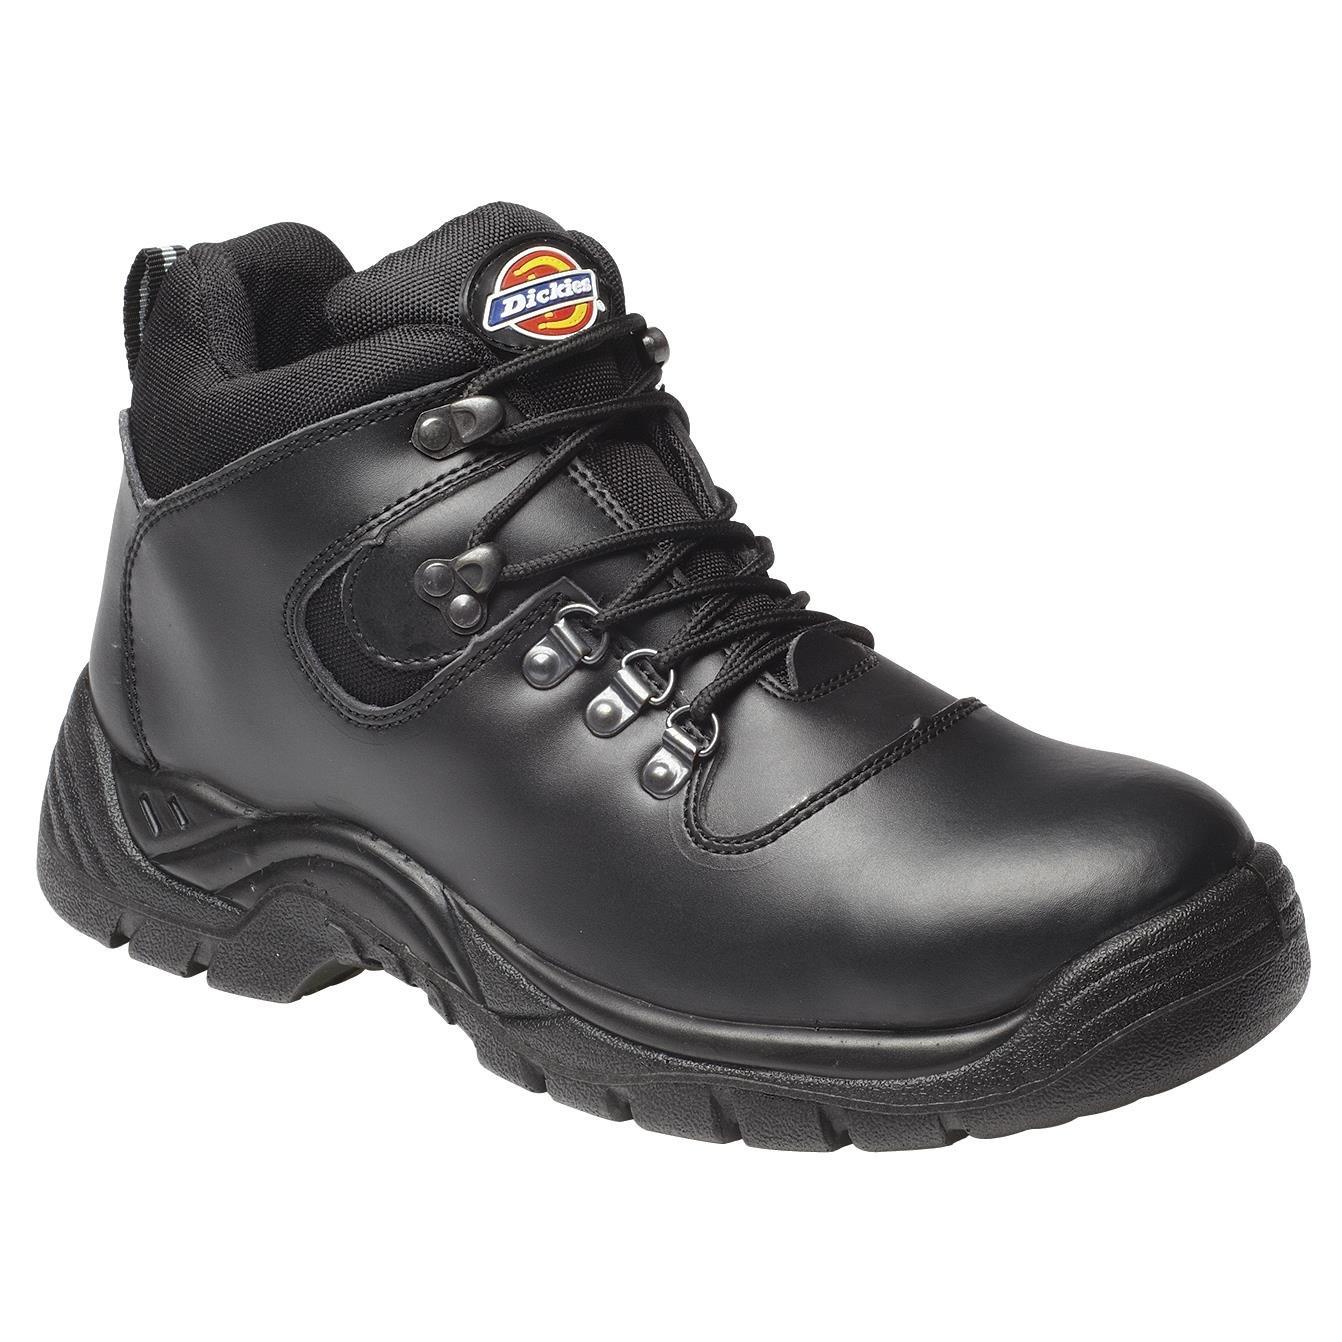 Dickies Fury Super / Safety Hiker - Black - UK 11 / Super US 12 / EU 46 B00K70L2JG Boots 22b466